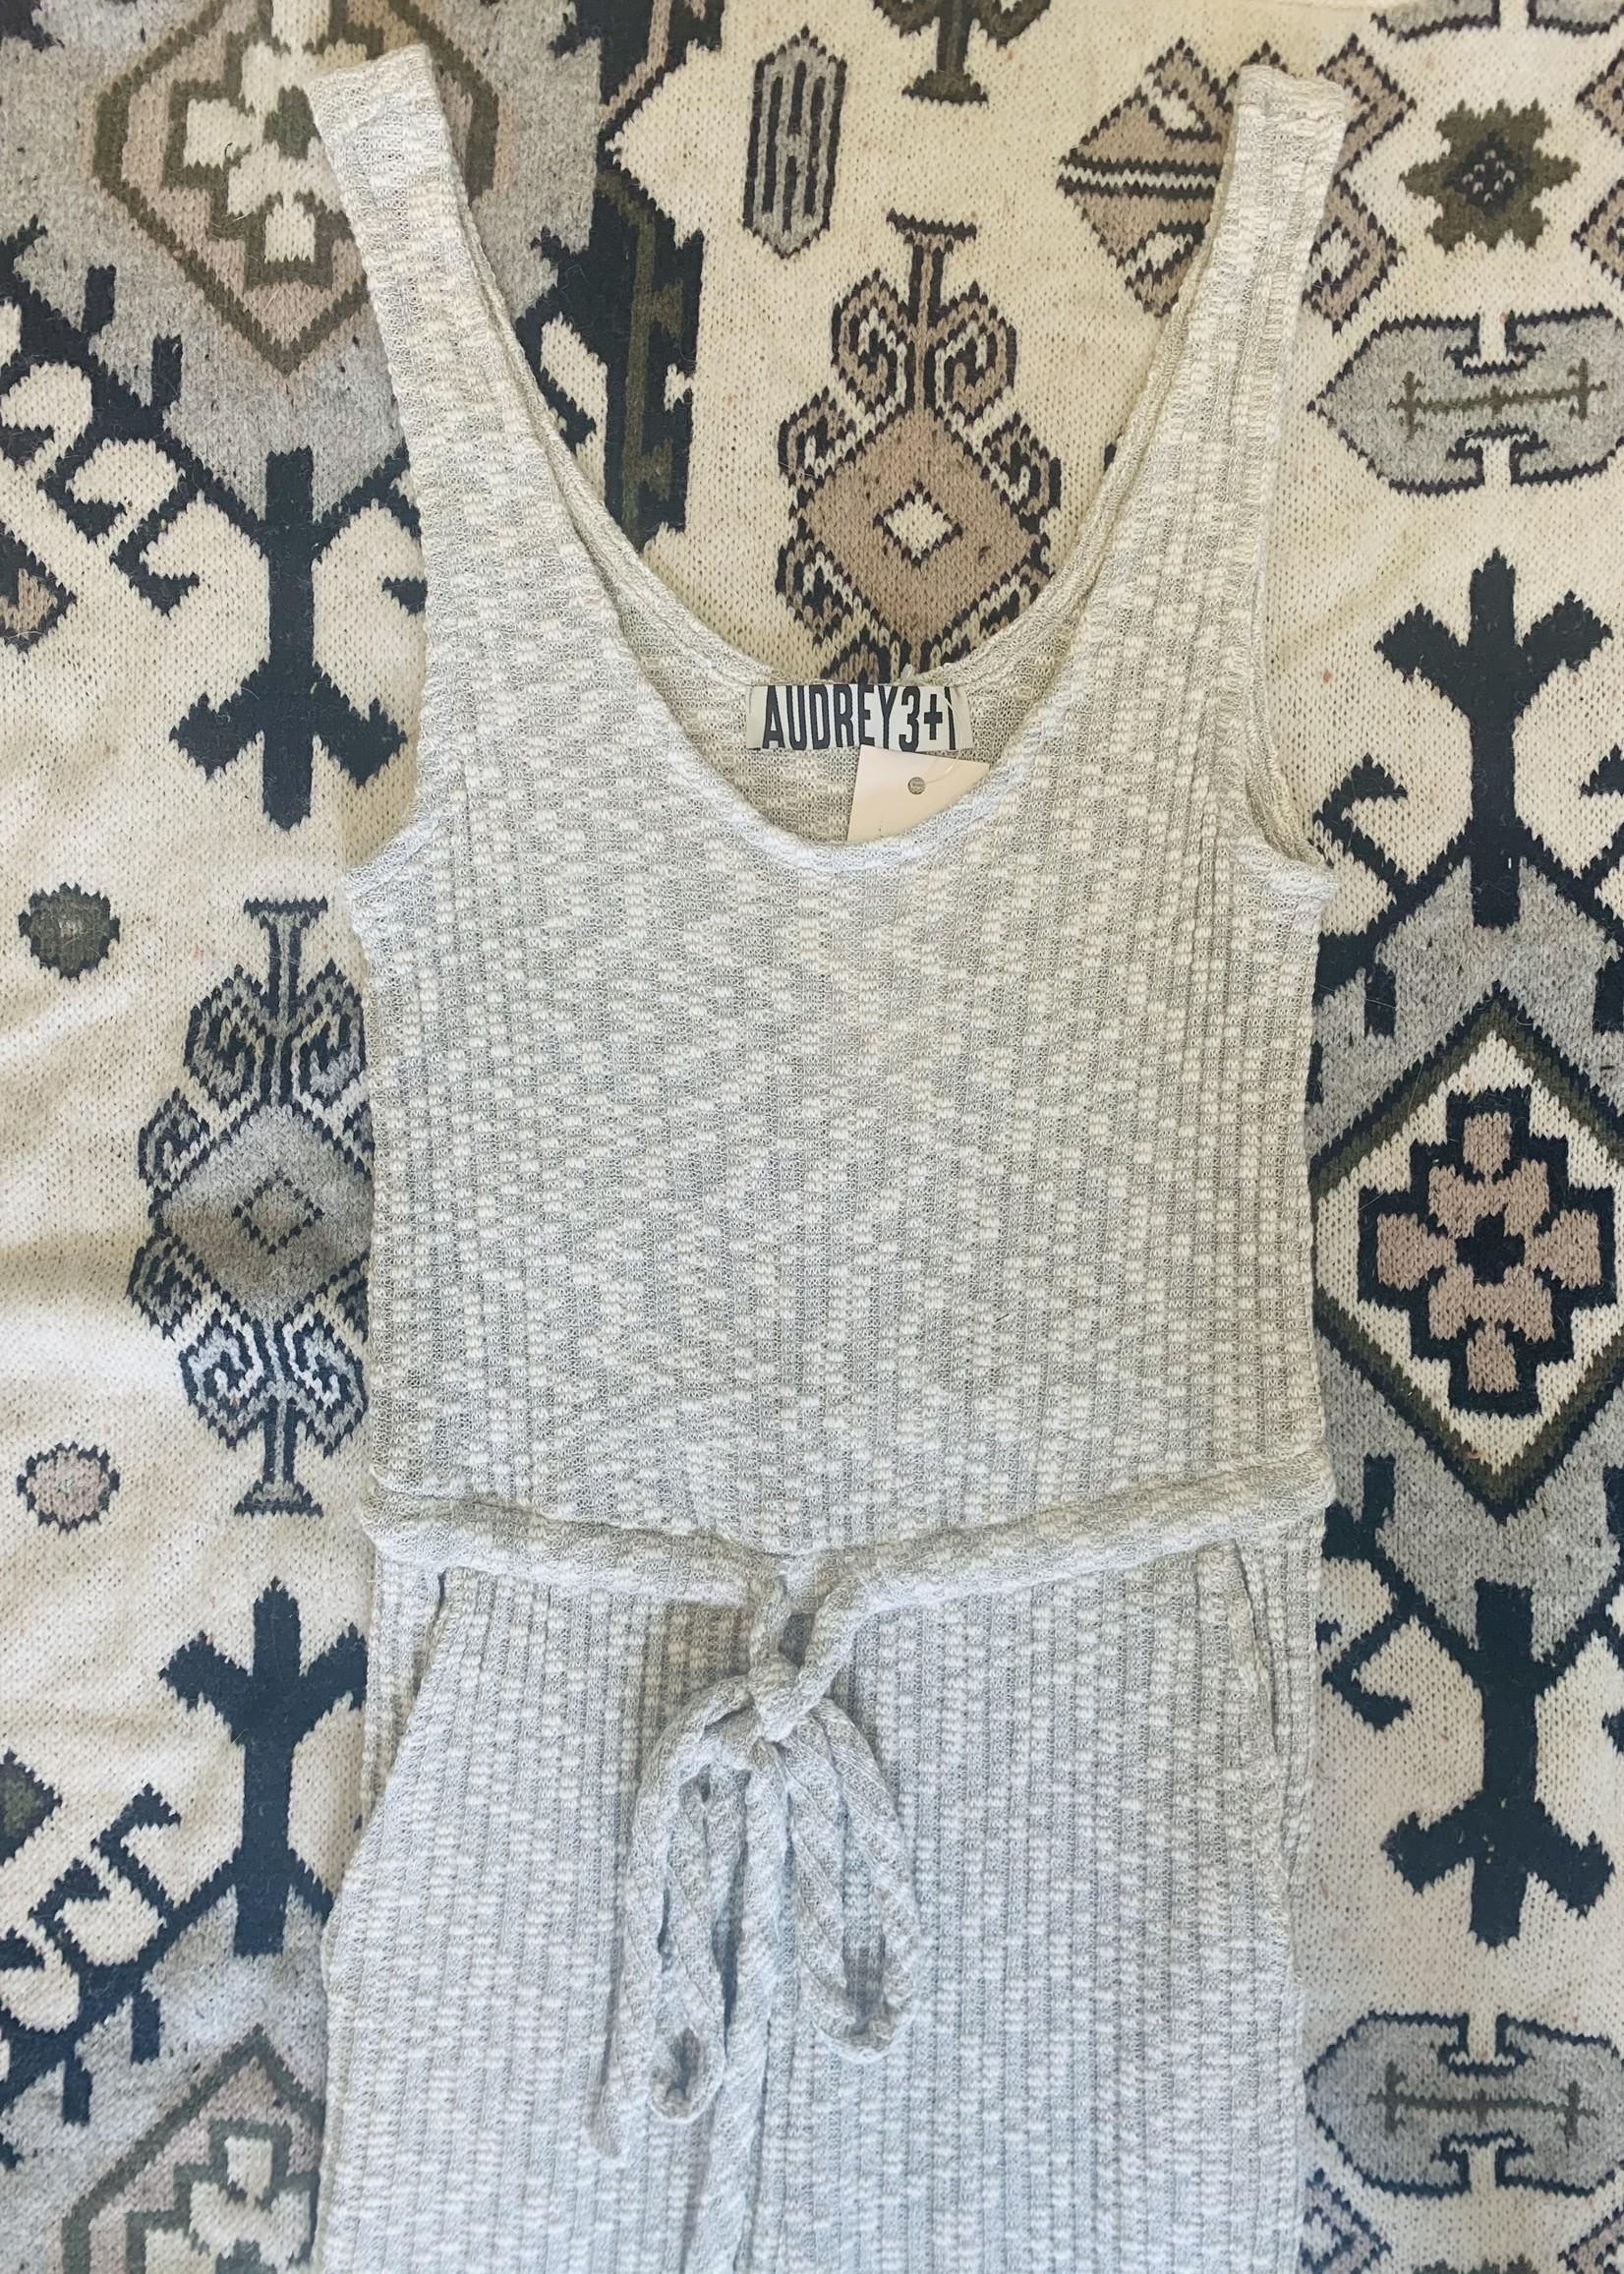 audrey audrey saturn jumper